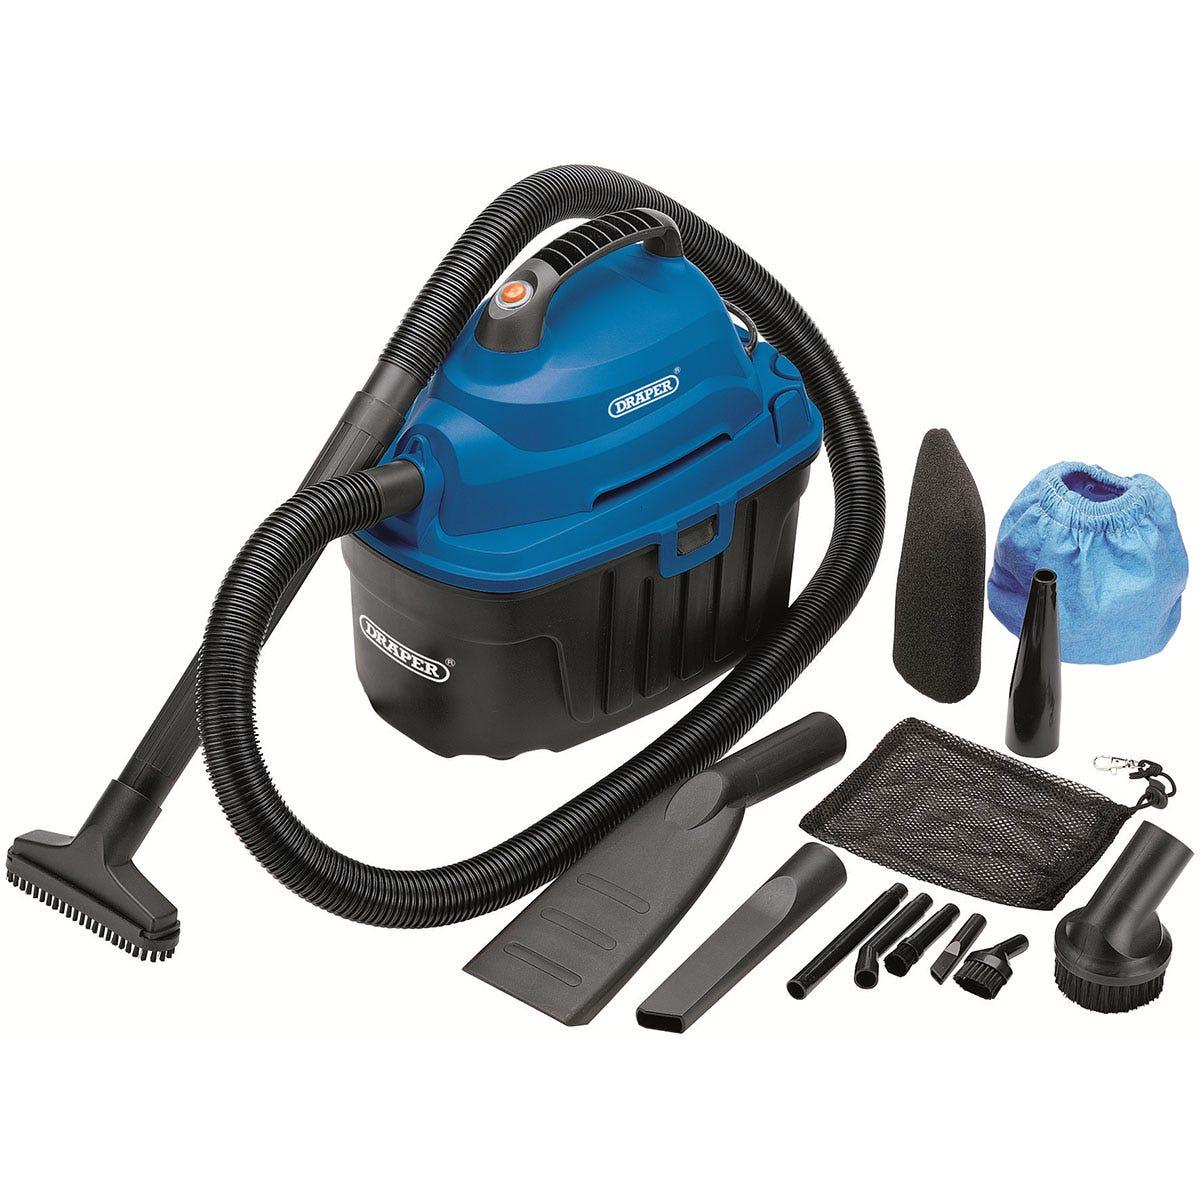 Draper 10L Wet and Dry Vacuum Cleaner (1000W) - Blue & Black